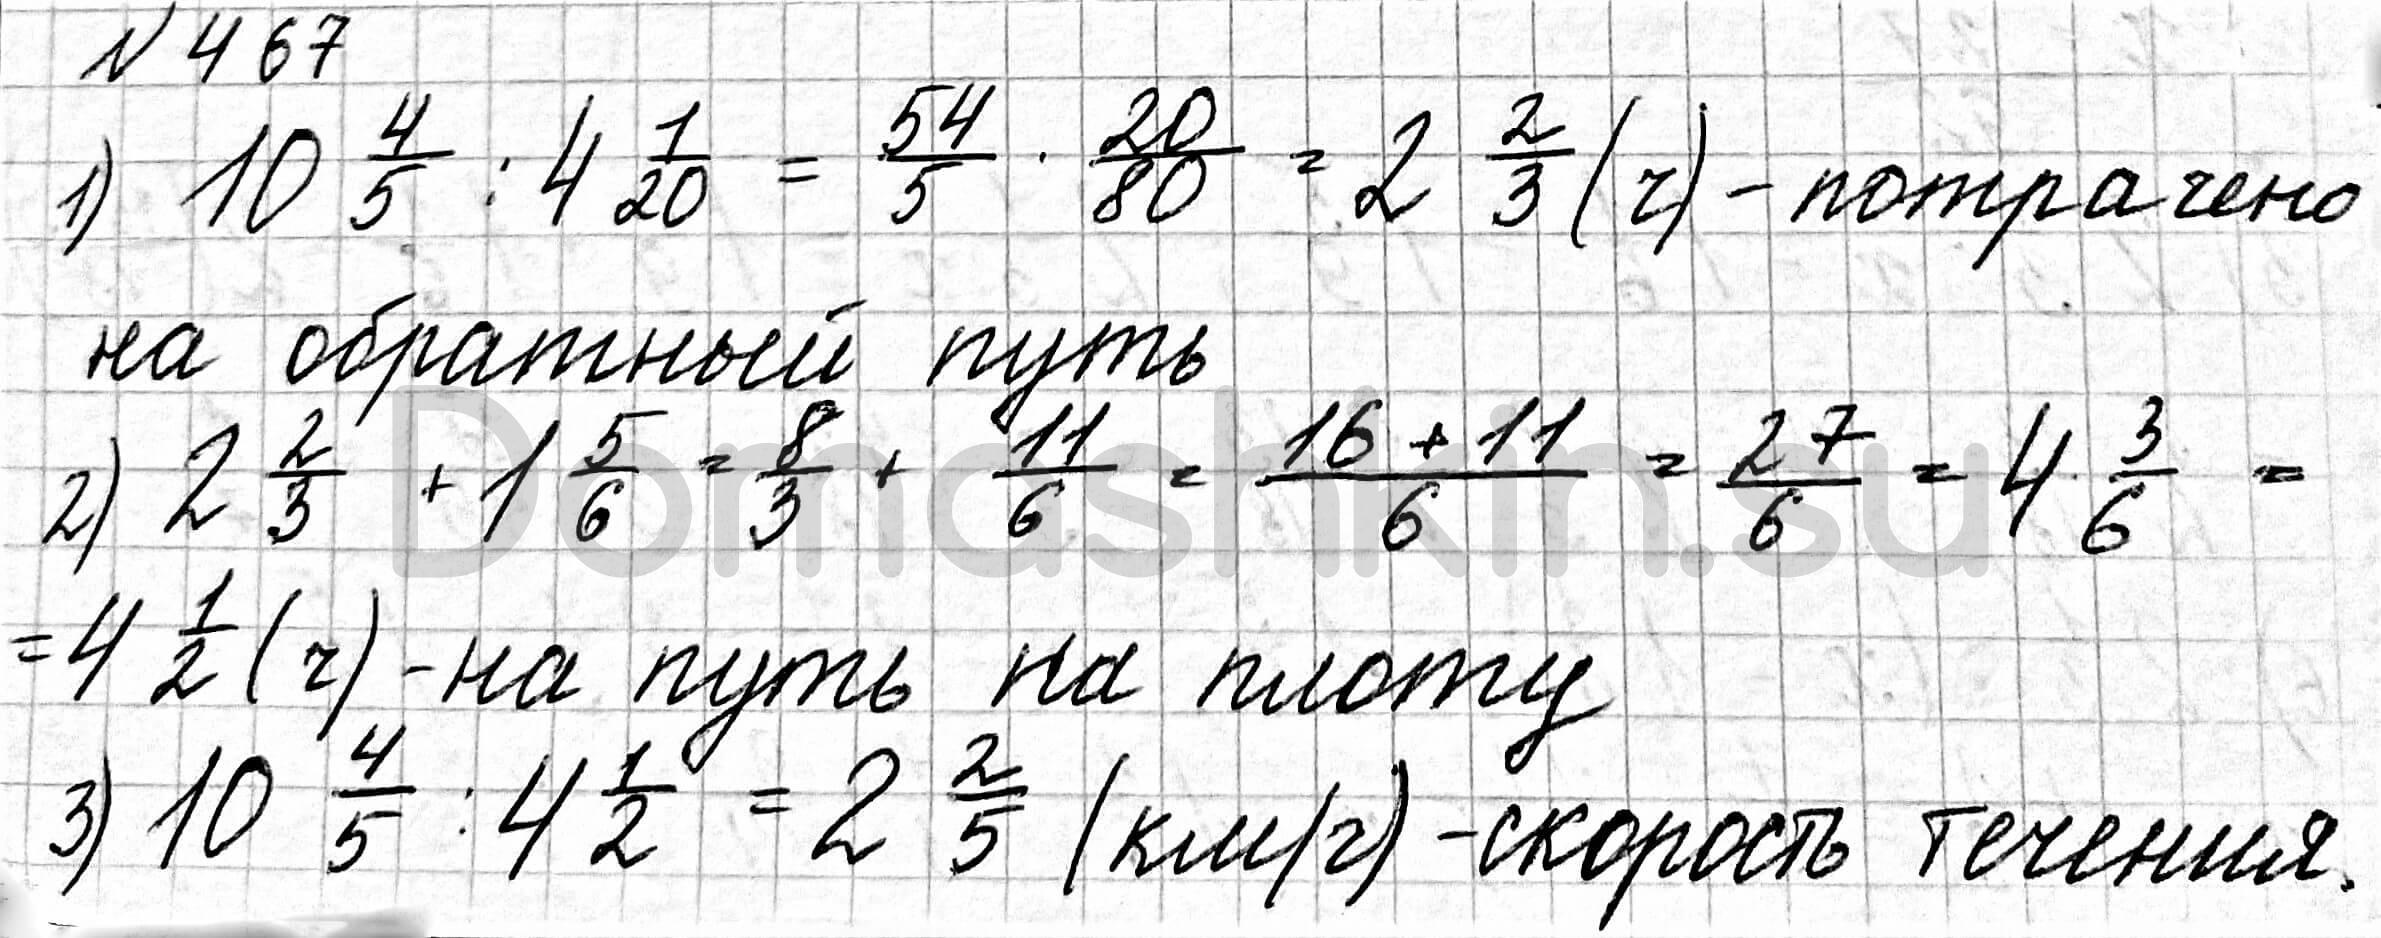 Математика 6 класс учебник Мерзляк номер 467 решение